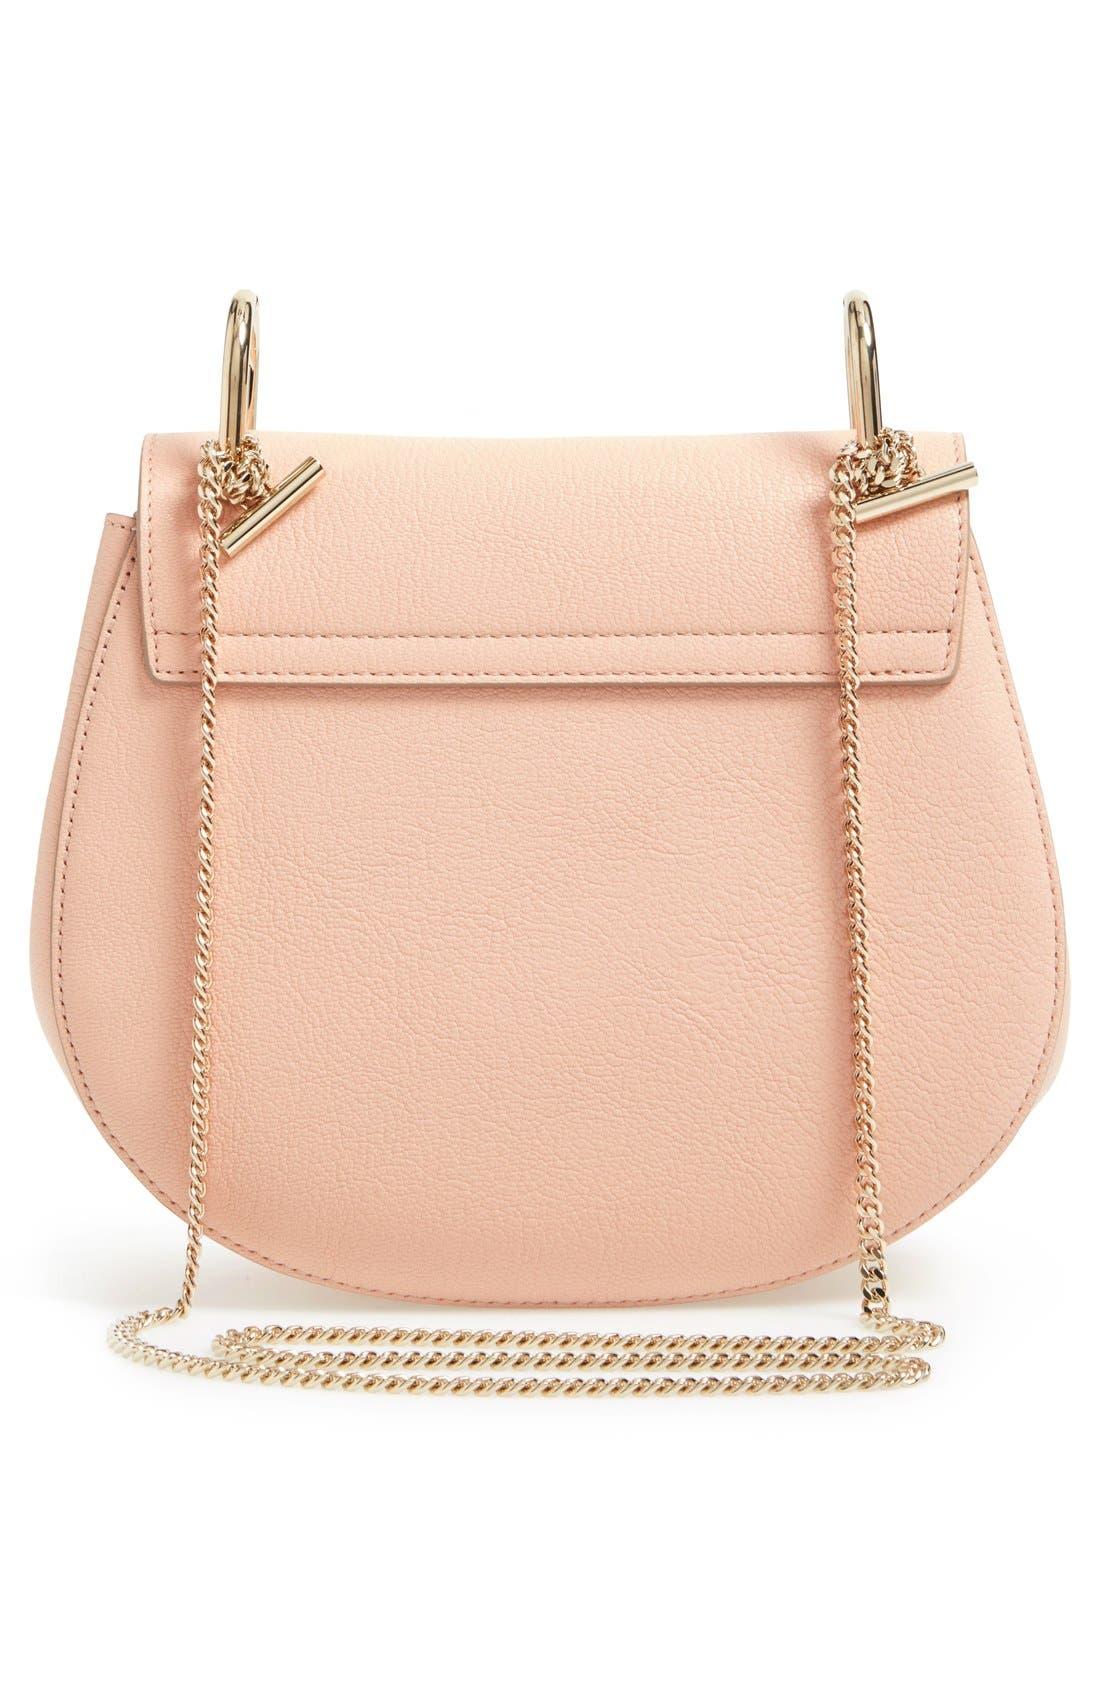 Alternate Image 3  - Chloé 'Small Drew' Goatskin Leather Shoulder Bag